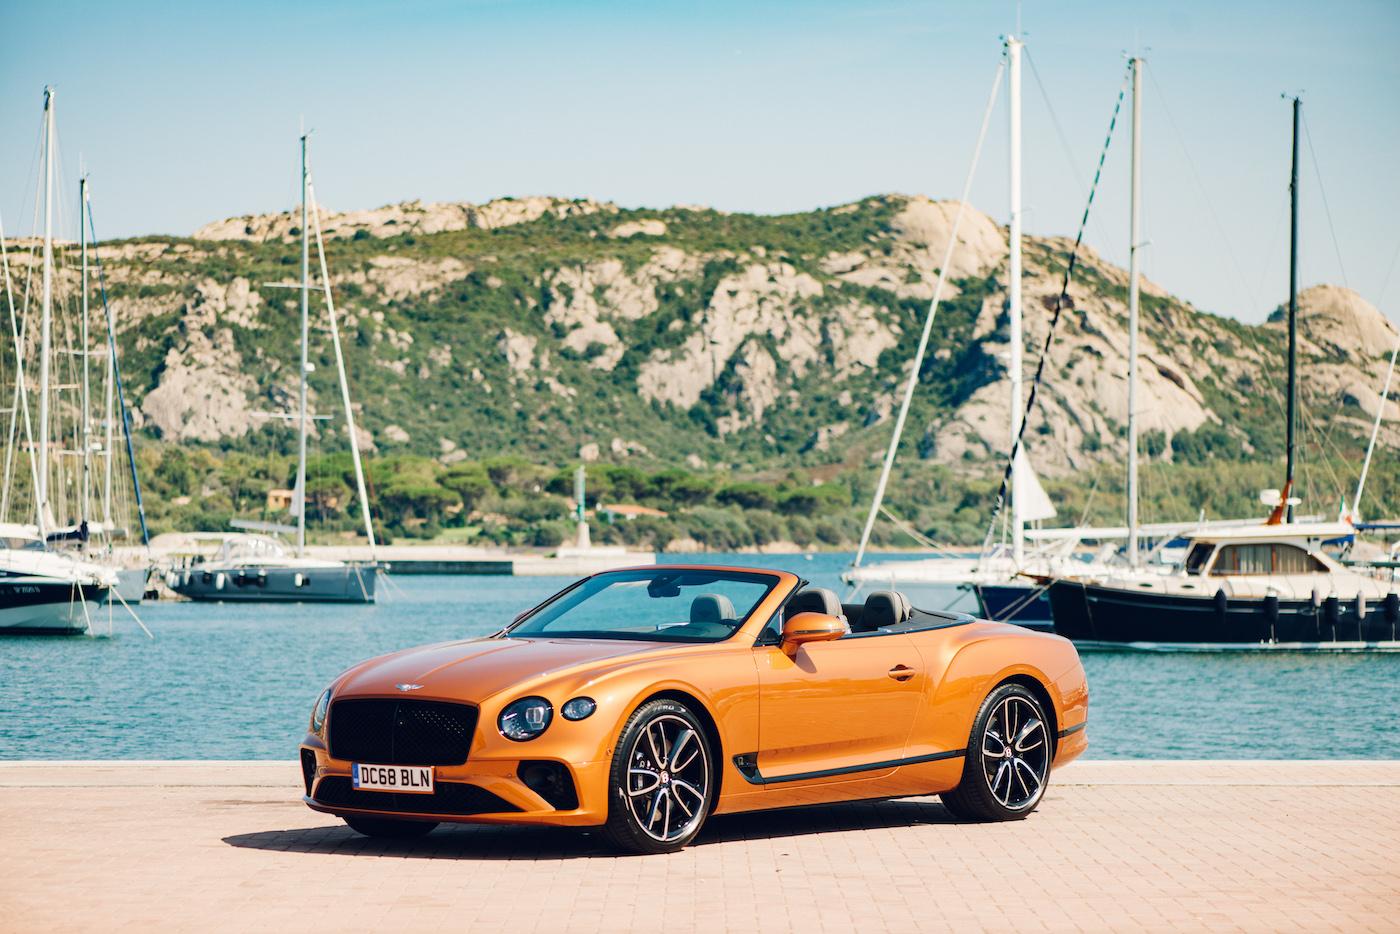 Mit Bentley in Porto Cervo: Die Bentley Summer Tour 2019 1